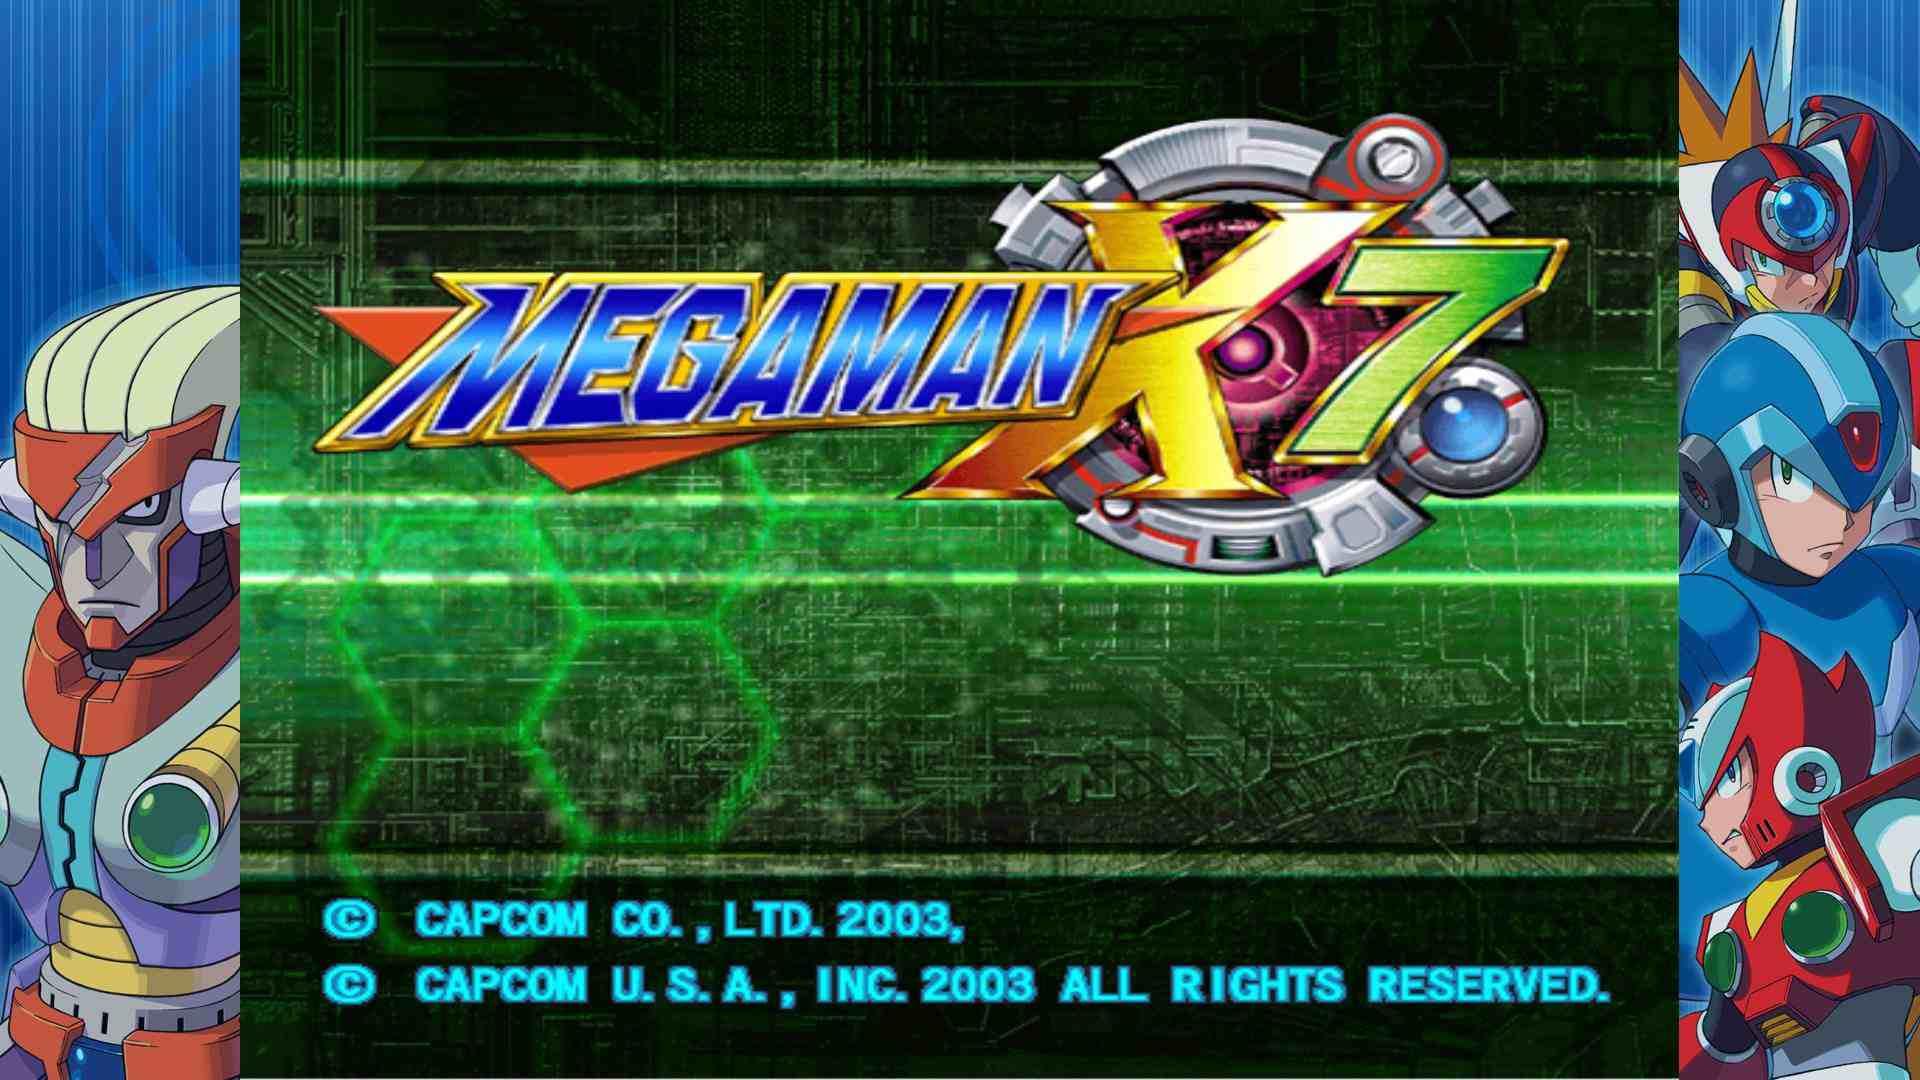 Mega Man X7 was released for multiple platforms in 2003.